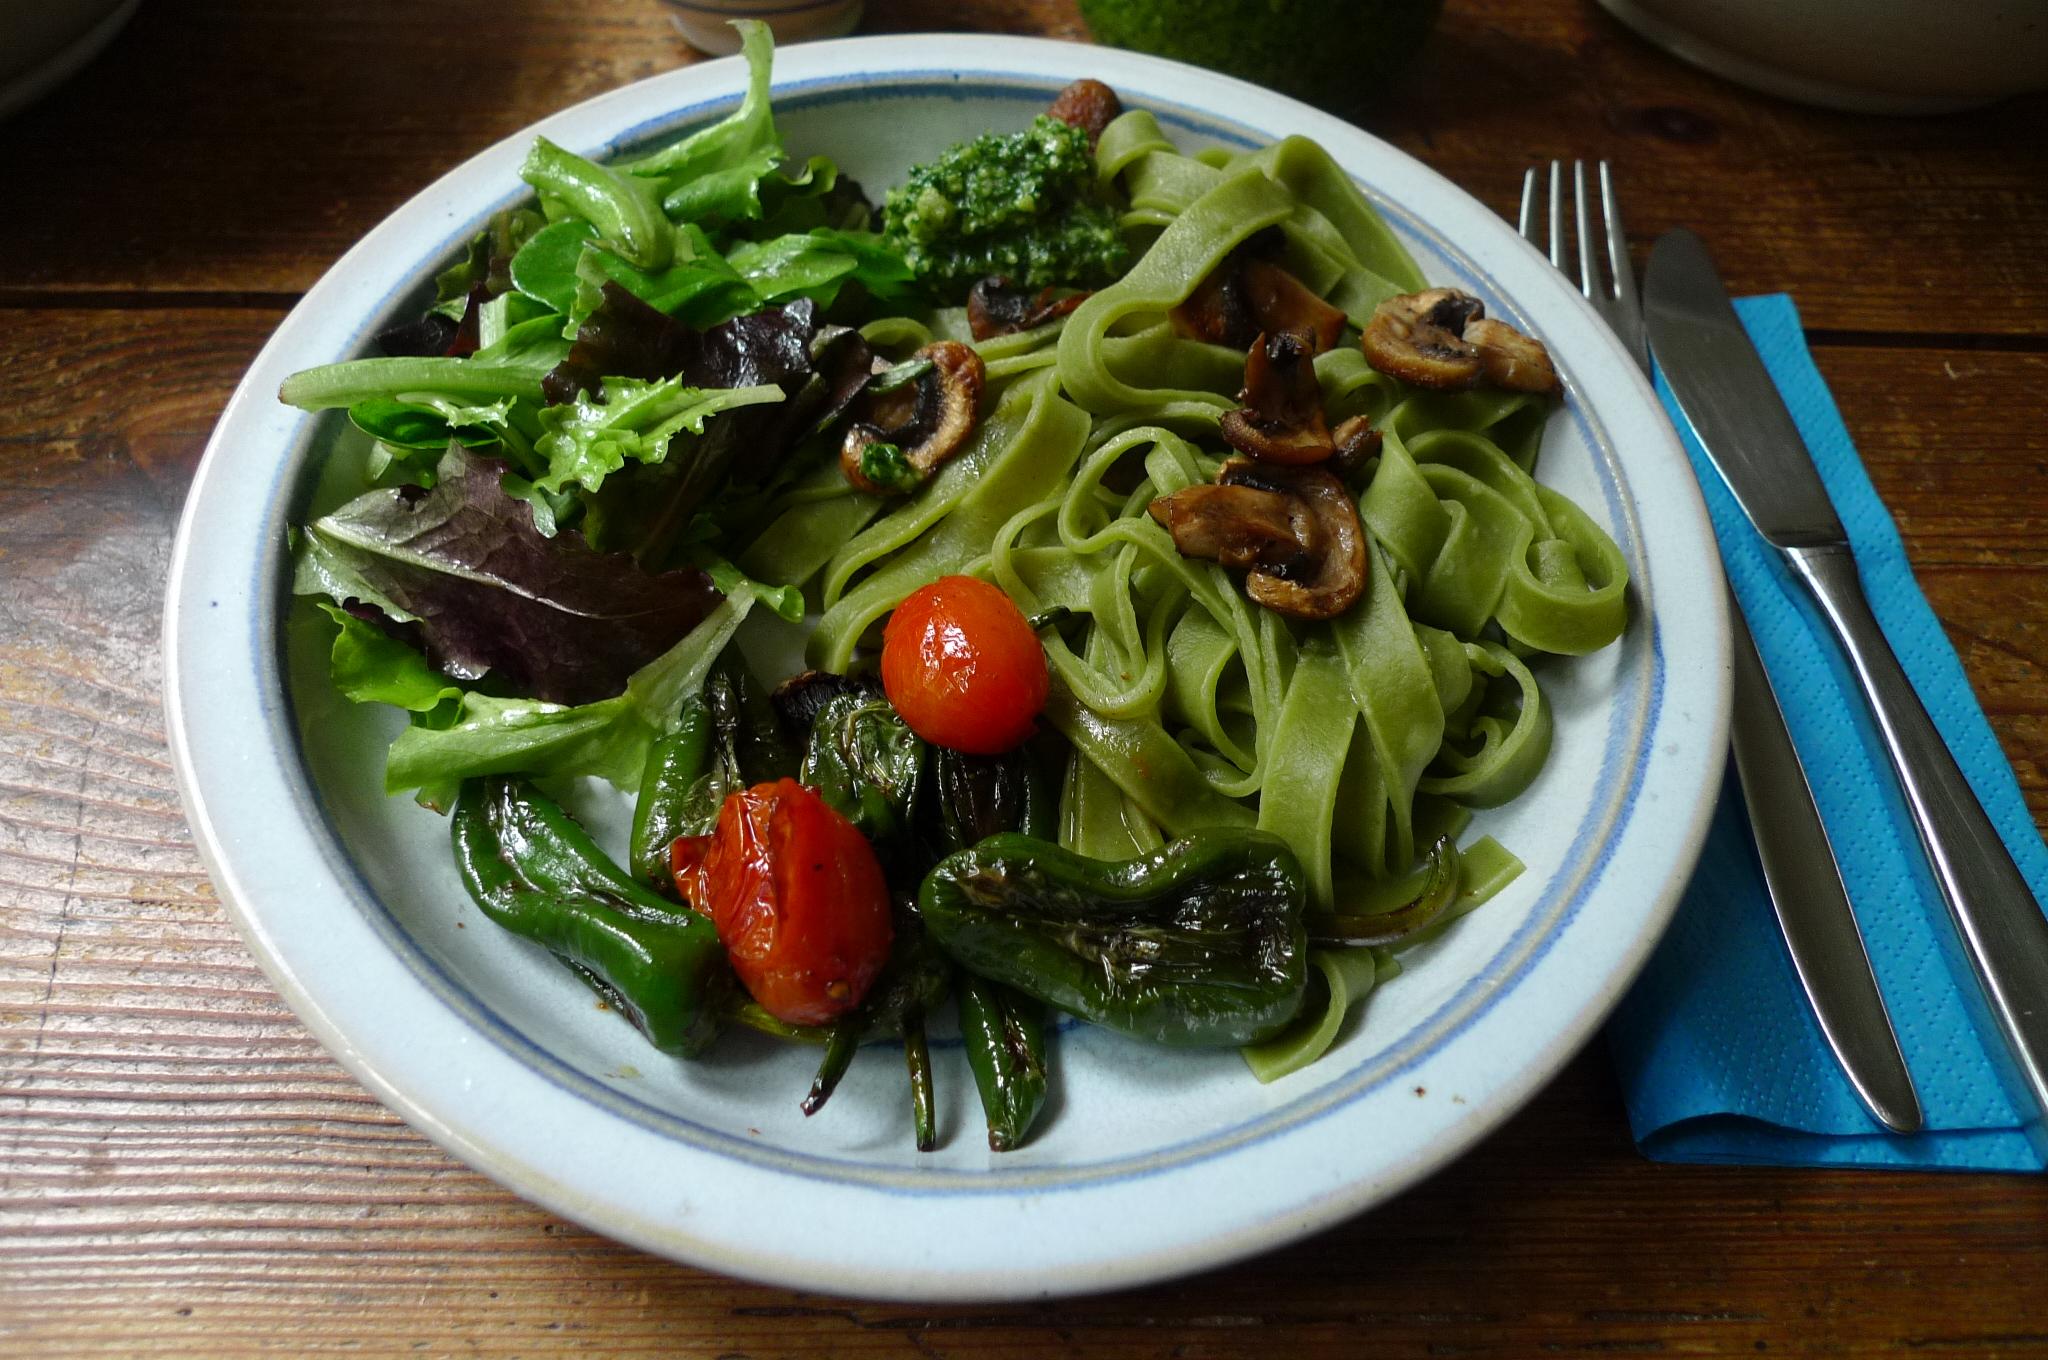 Grüne Nudeln,Ruccolapesto,Pilze,Bratpaprika,Salat-8.3.15   (9)